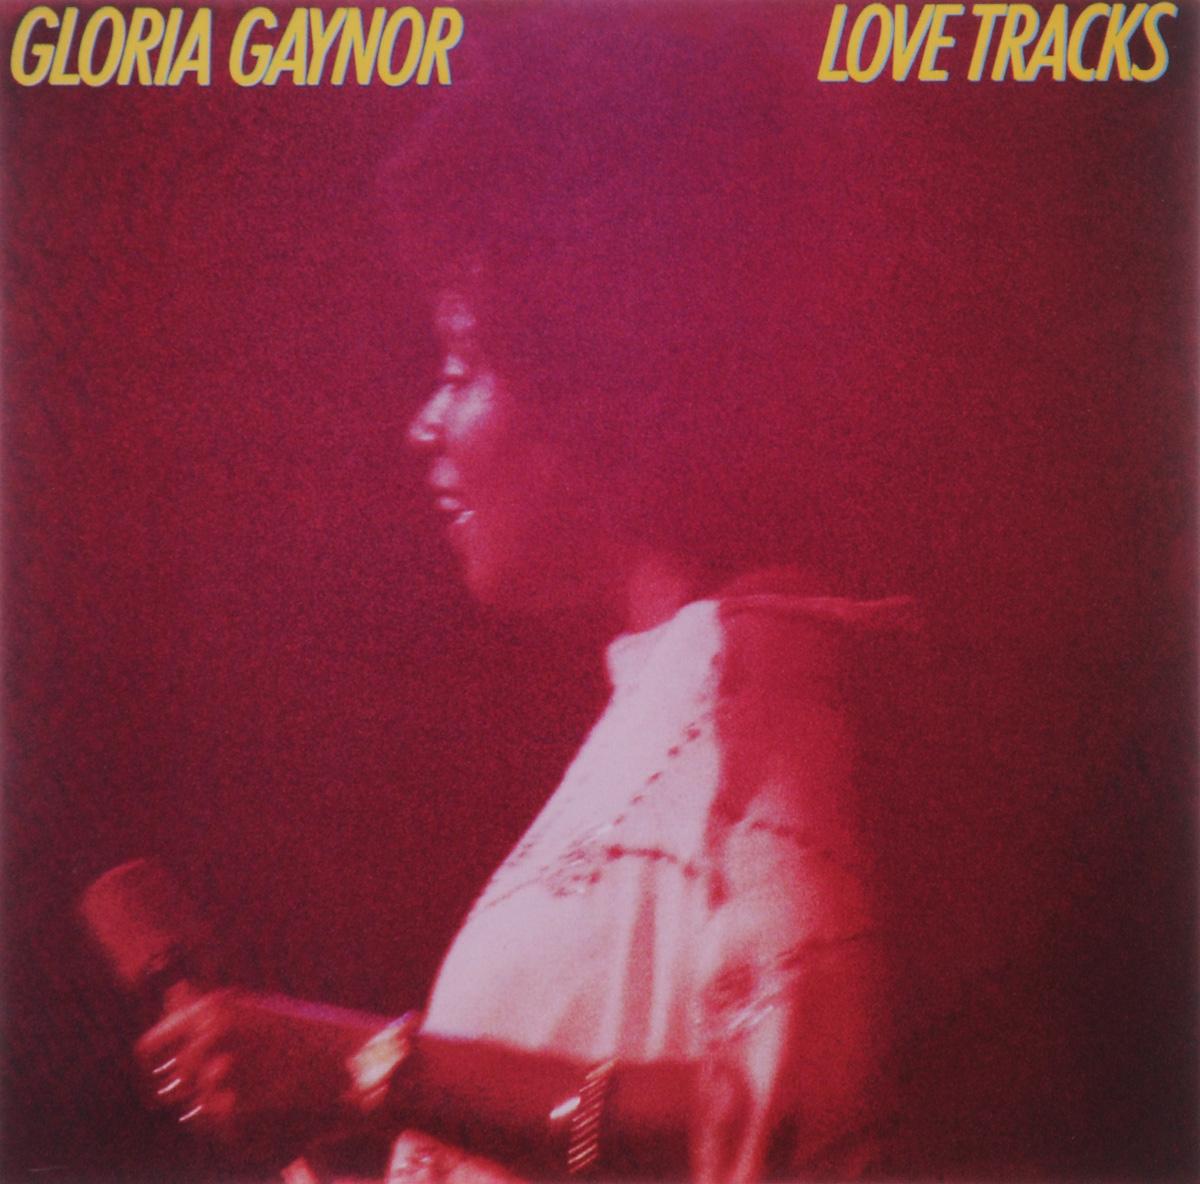 Глория Гейнор Gloria Gaynor. Love Tracks комбинезон с рисунком глория джинс bcv000170 gloria jeans